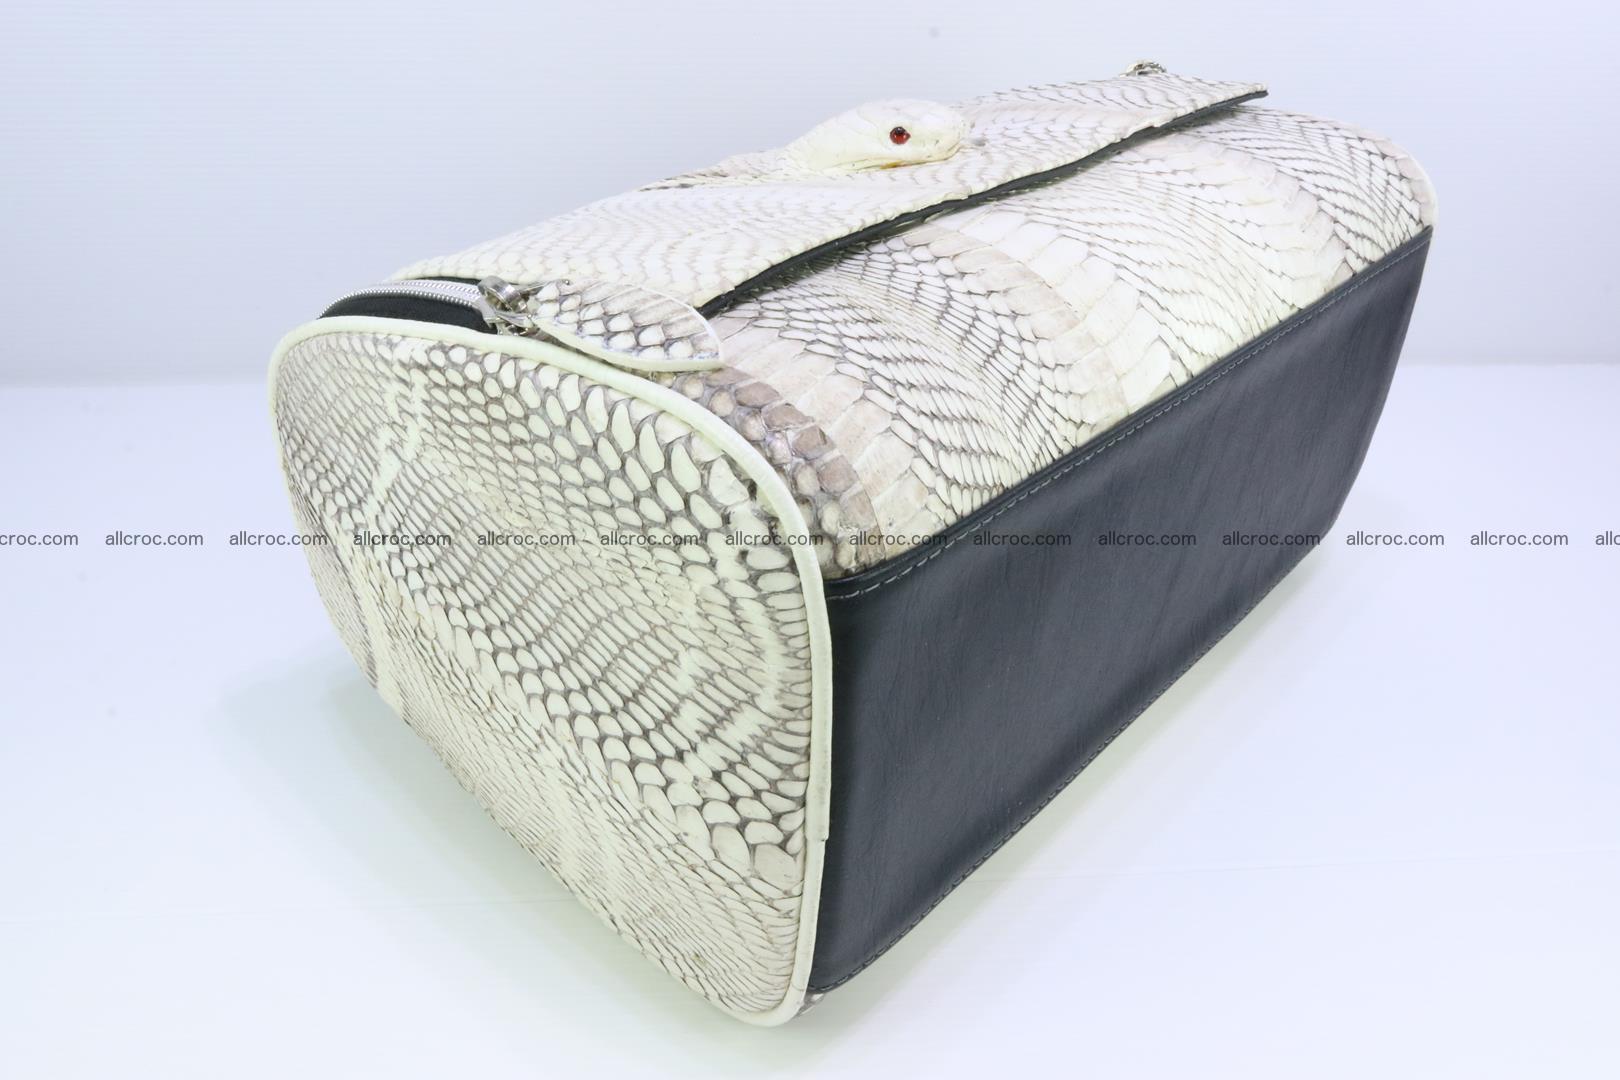 Cobra skin ladies handbag with head of cobra 195 Foto 9